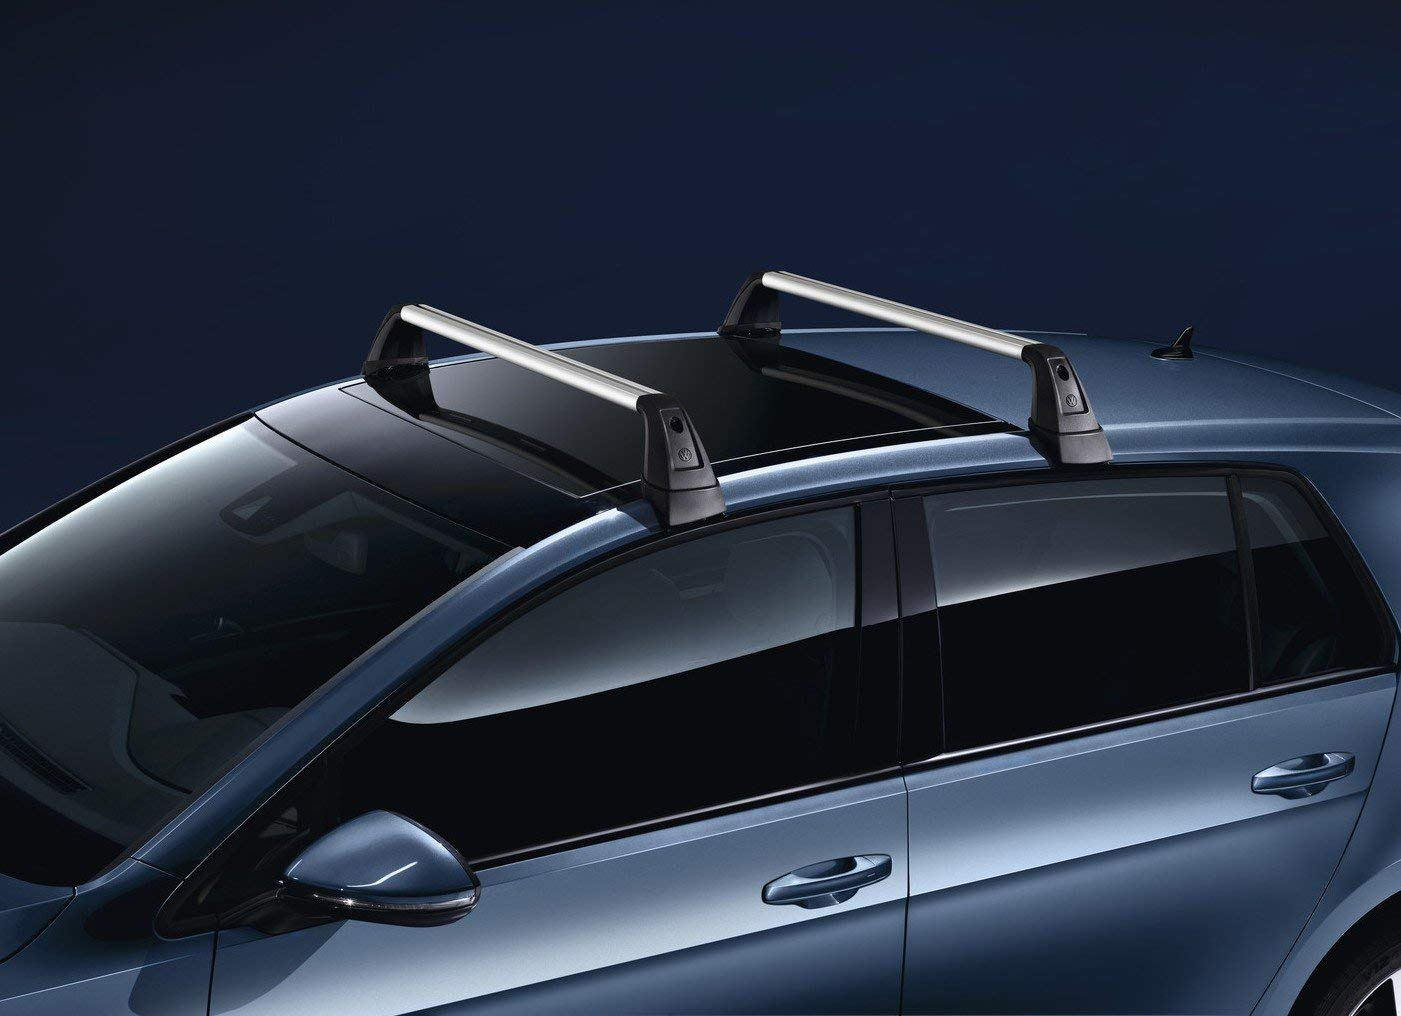 Audi Q7 E Tron >> raum22 Wraps Audi R8 Like F16 Arctic Aggressor Fighter Jet - Fourtitude.com